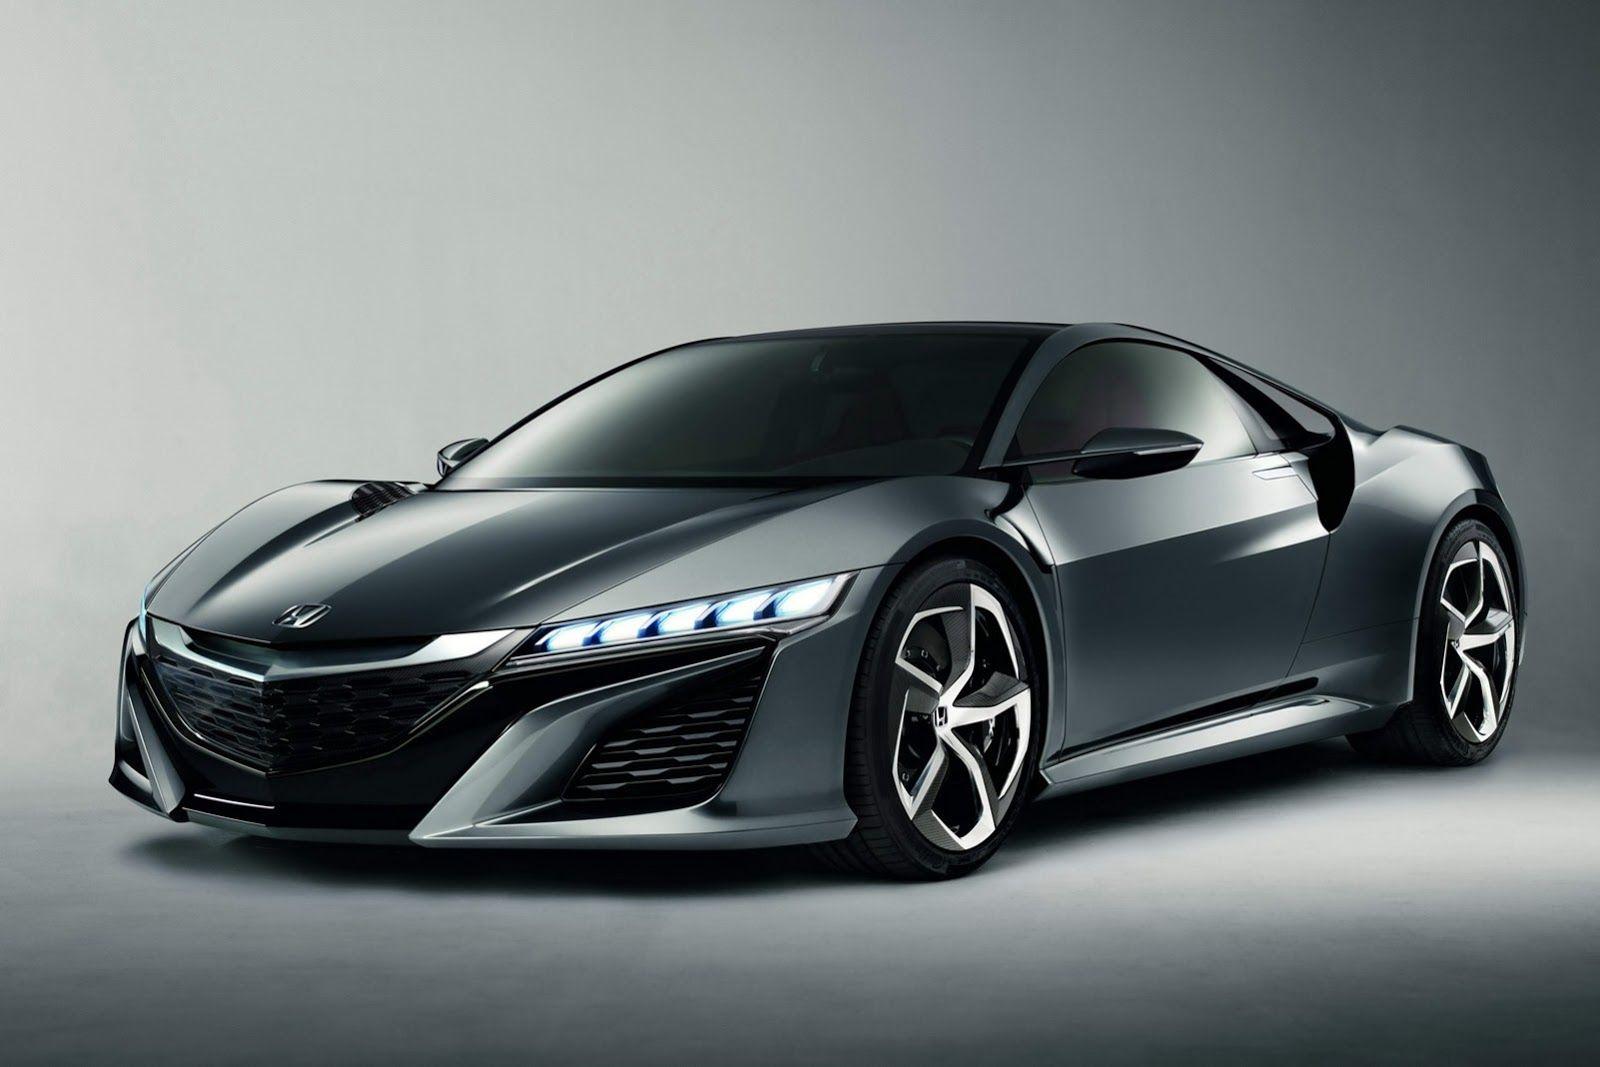 Bon 2015 Acura NSX Concept Car Design Get Your Wallet Ready. Check Your Car  Insurance.